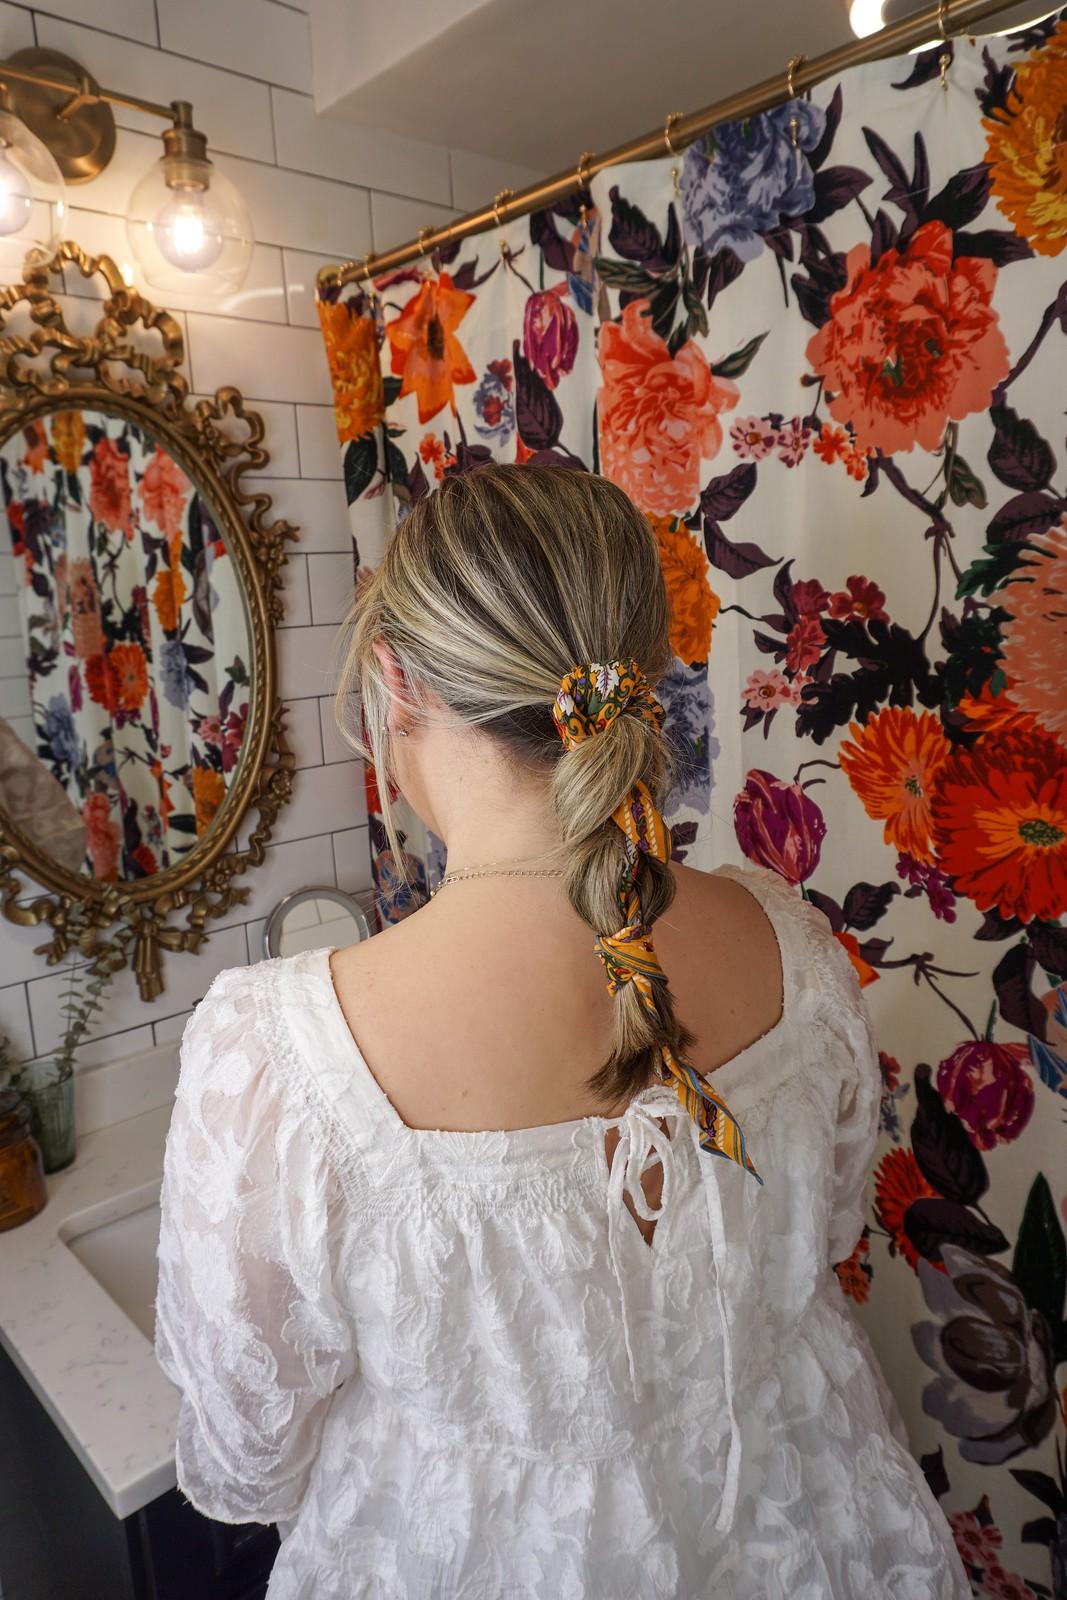 Scarf Braid | 6 Ways to Wear a Scarf in Your Hair | How to Wear a Scarf in Your Hair | Easy Hair Tutorial | Summer Hair Tutorials | Hair Tutorial Videos